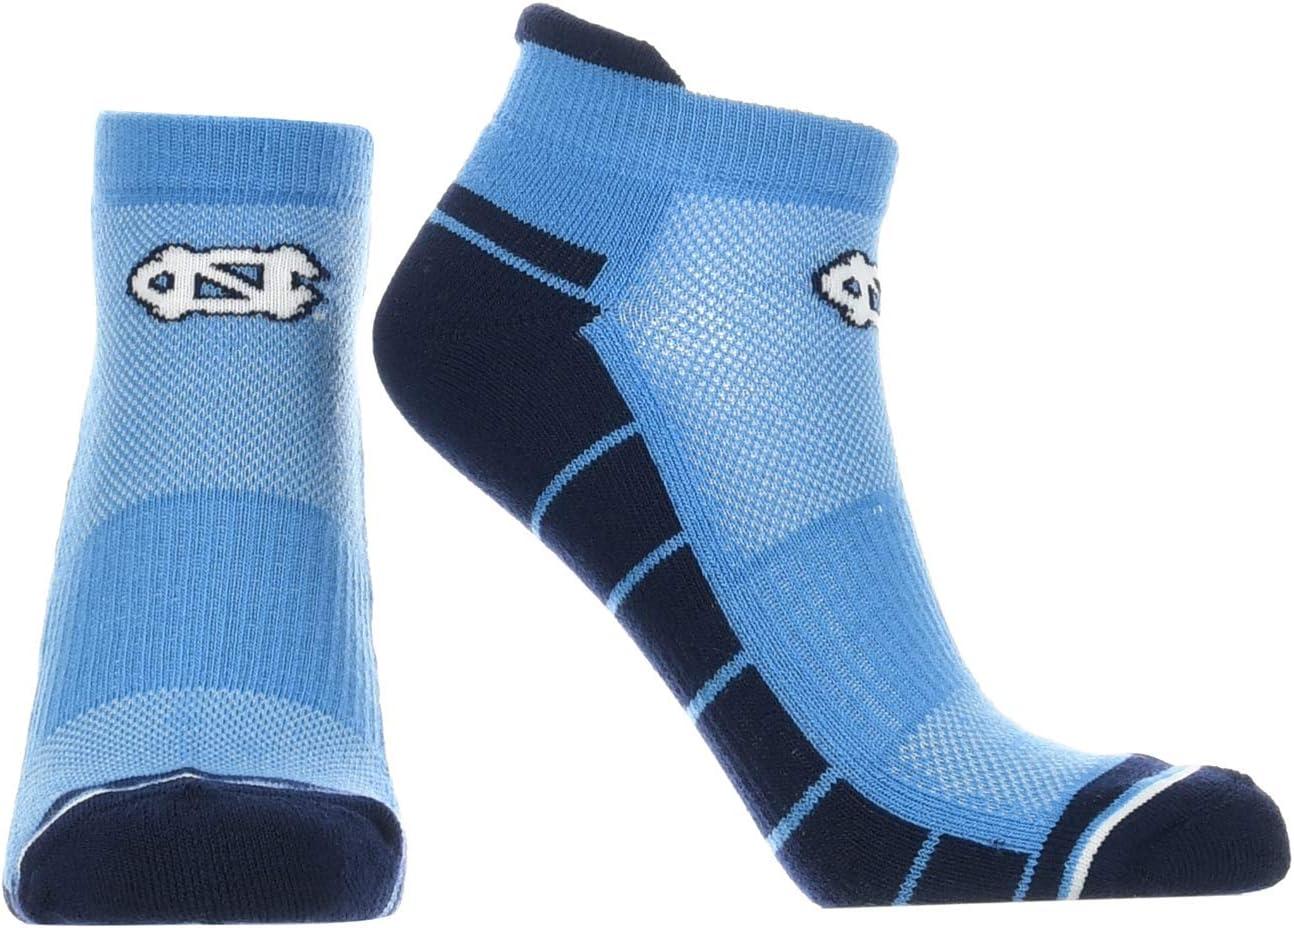 NCAA Womens Low Cut Performance Sock